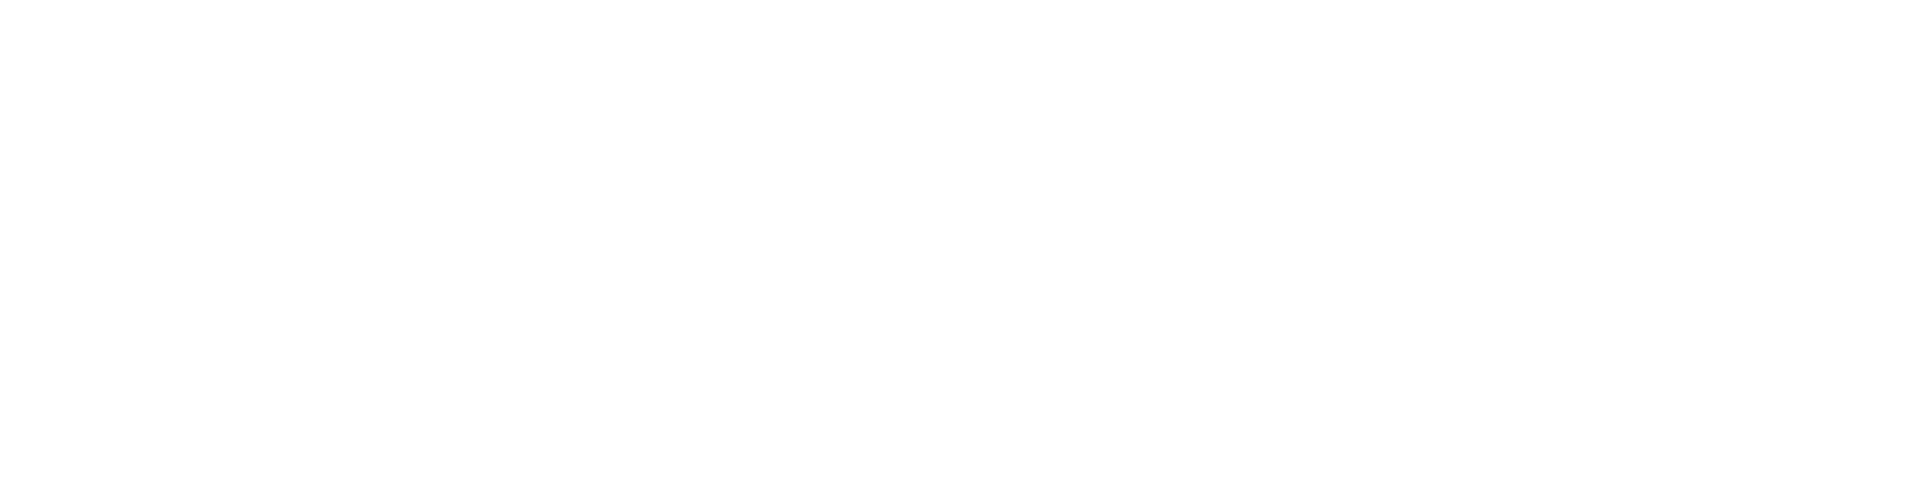 77a77